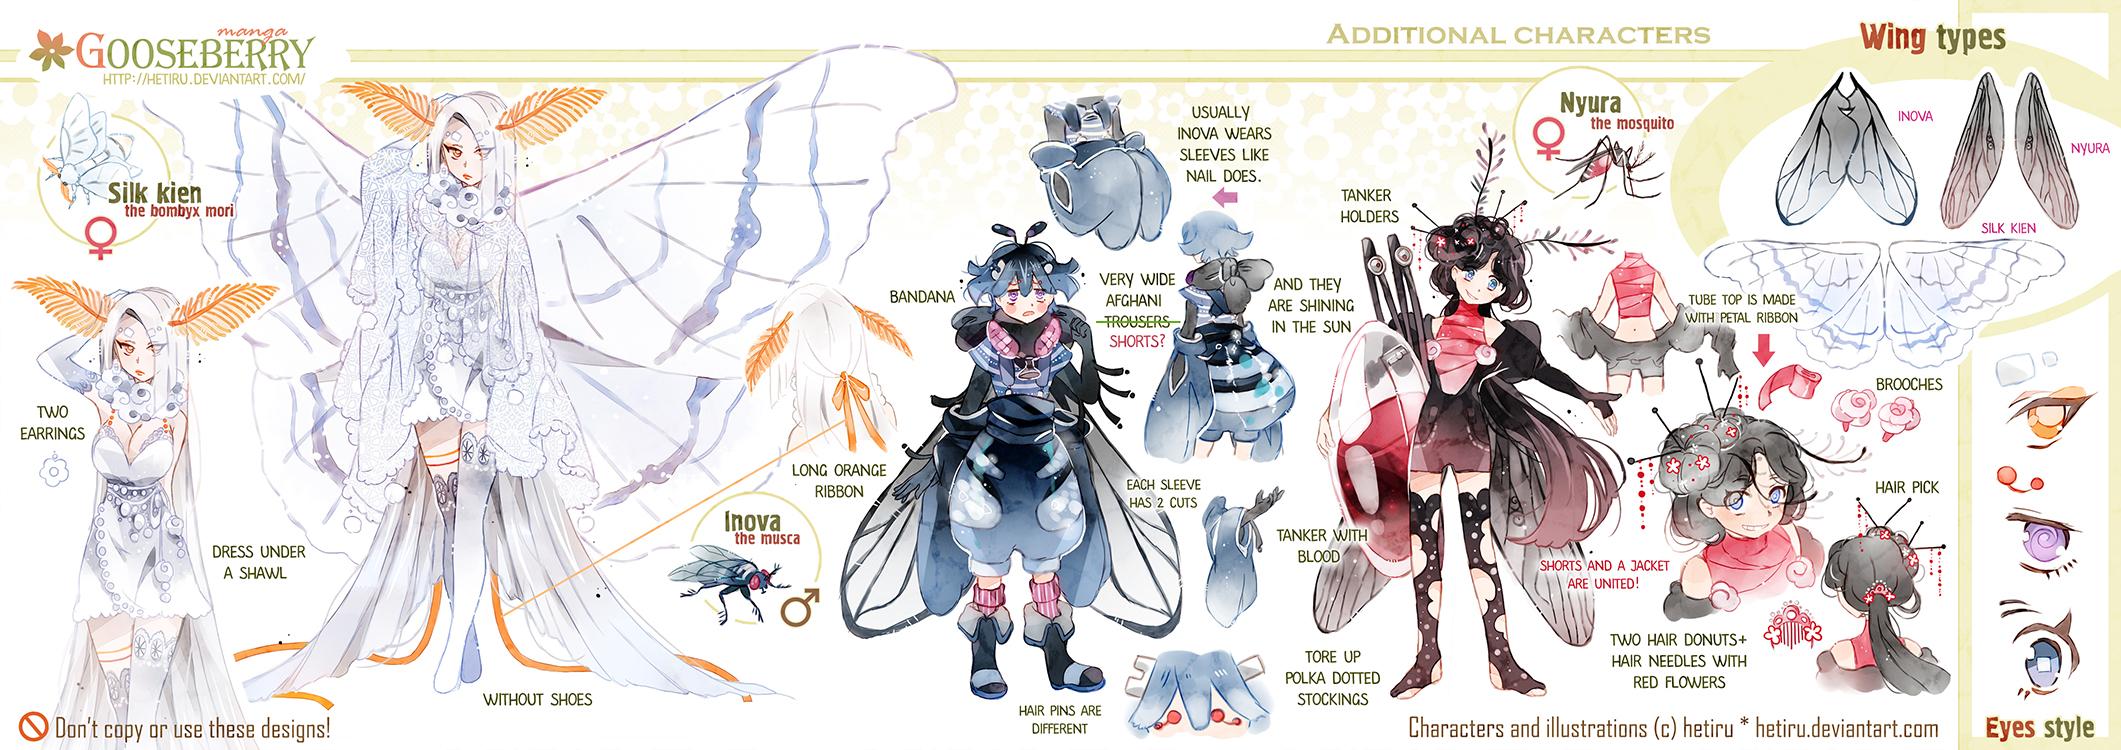 .GOOSEBERRY's bonus promo characters' ref. by Hetiru